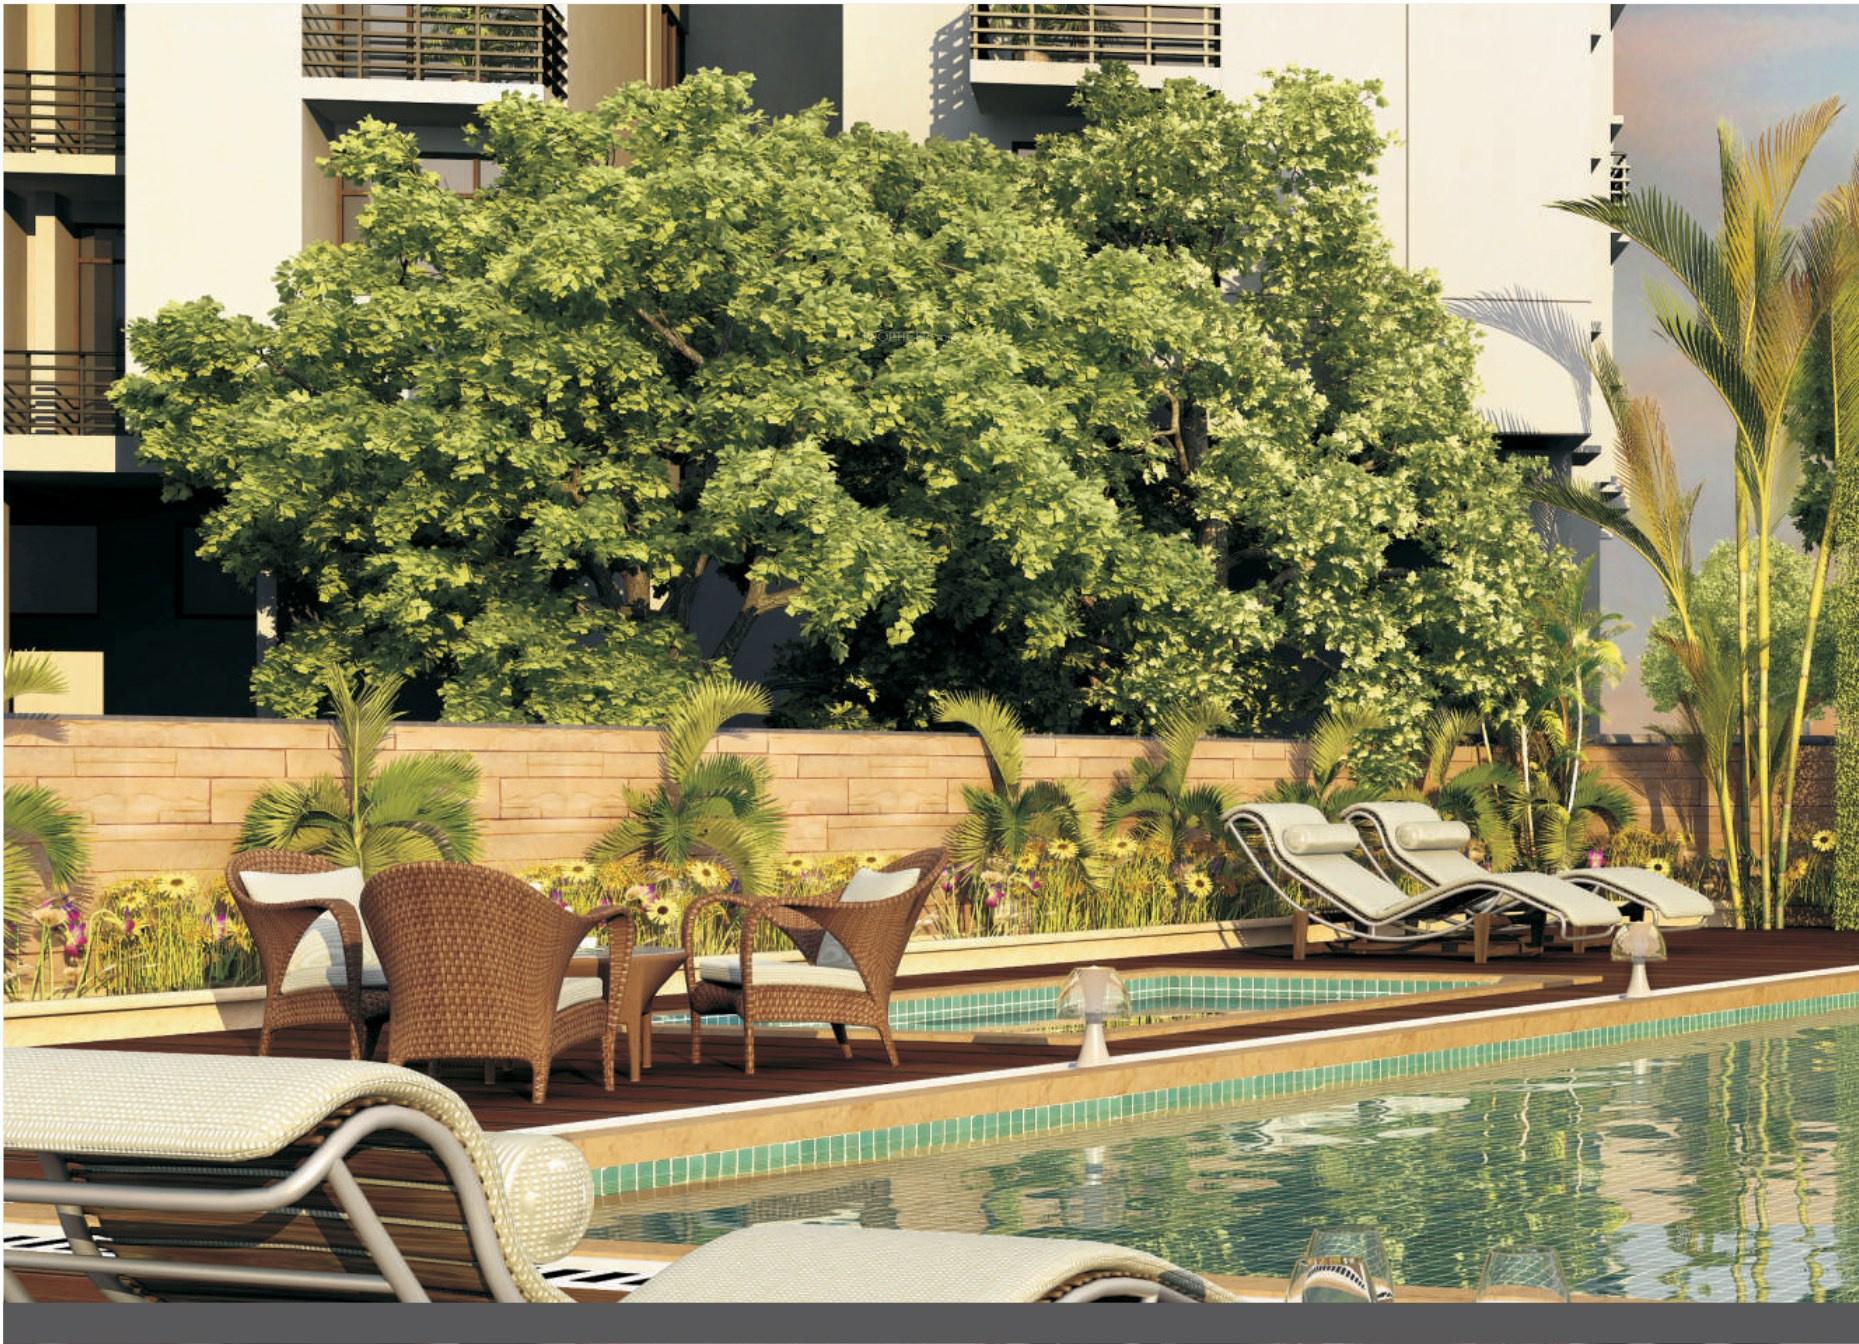 Hoysala hoysala ace in sahakar nagar bangalore price location map floor plan reviews for Swimming pool near sahakar nagar bangalore